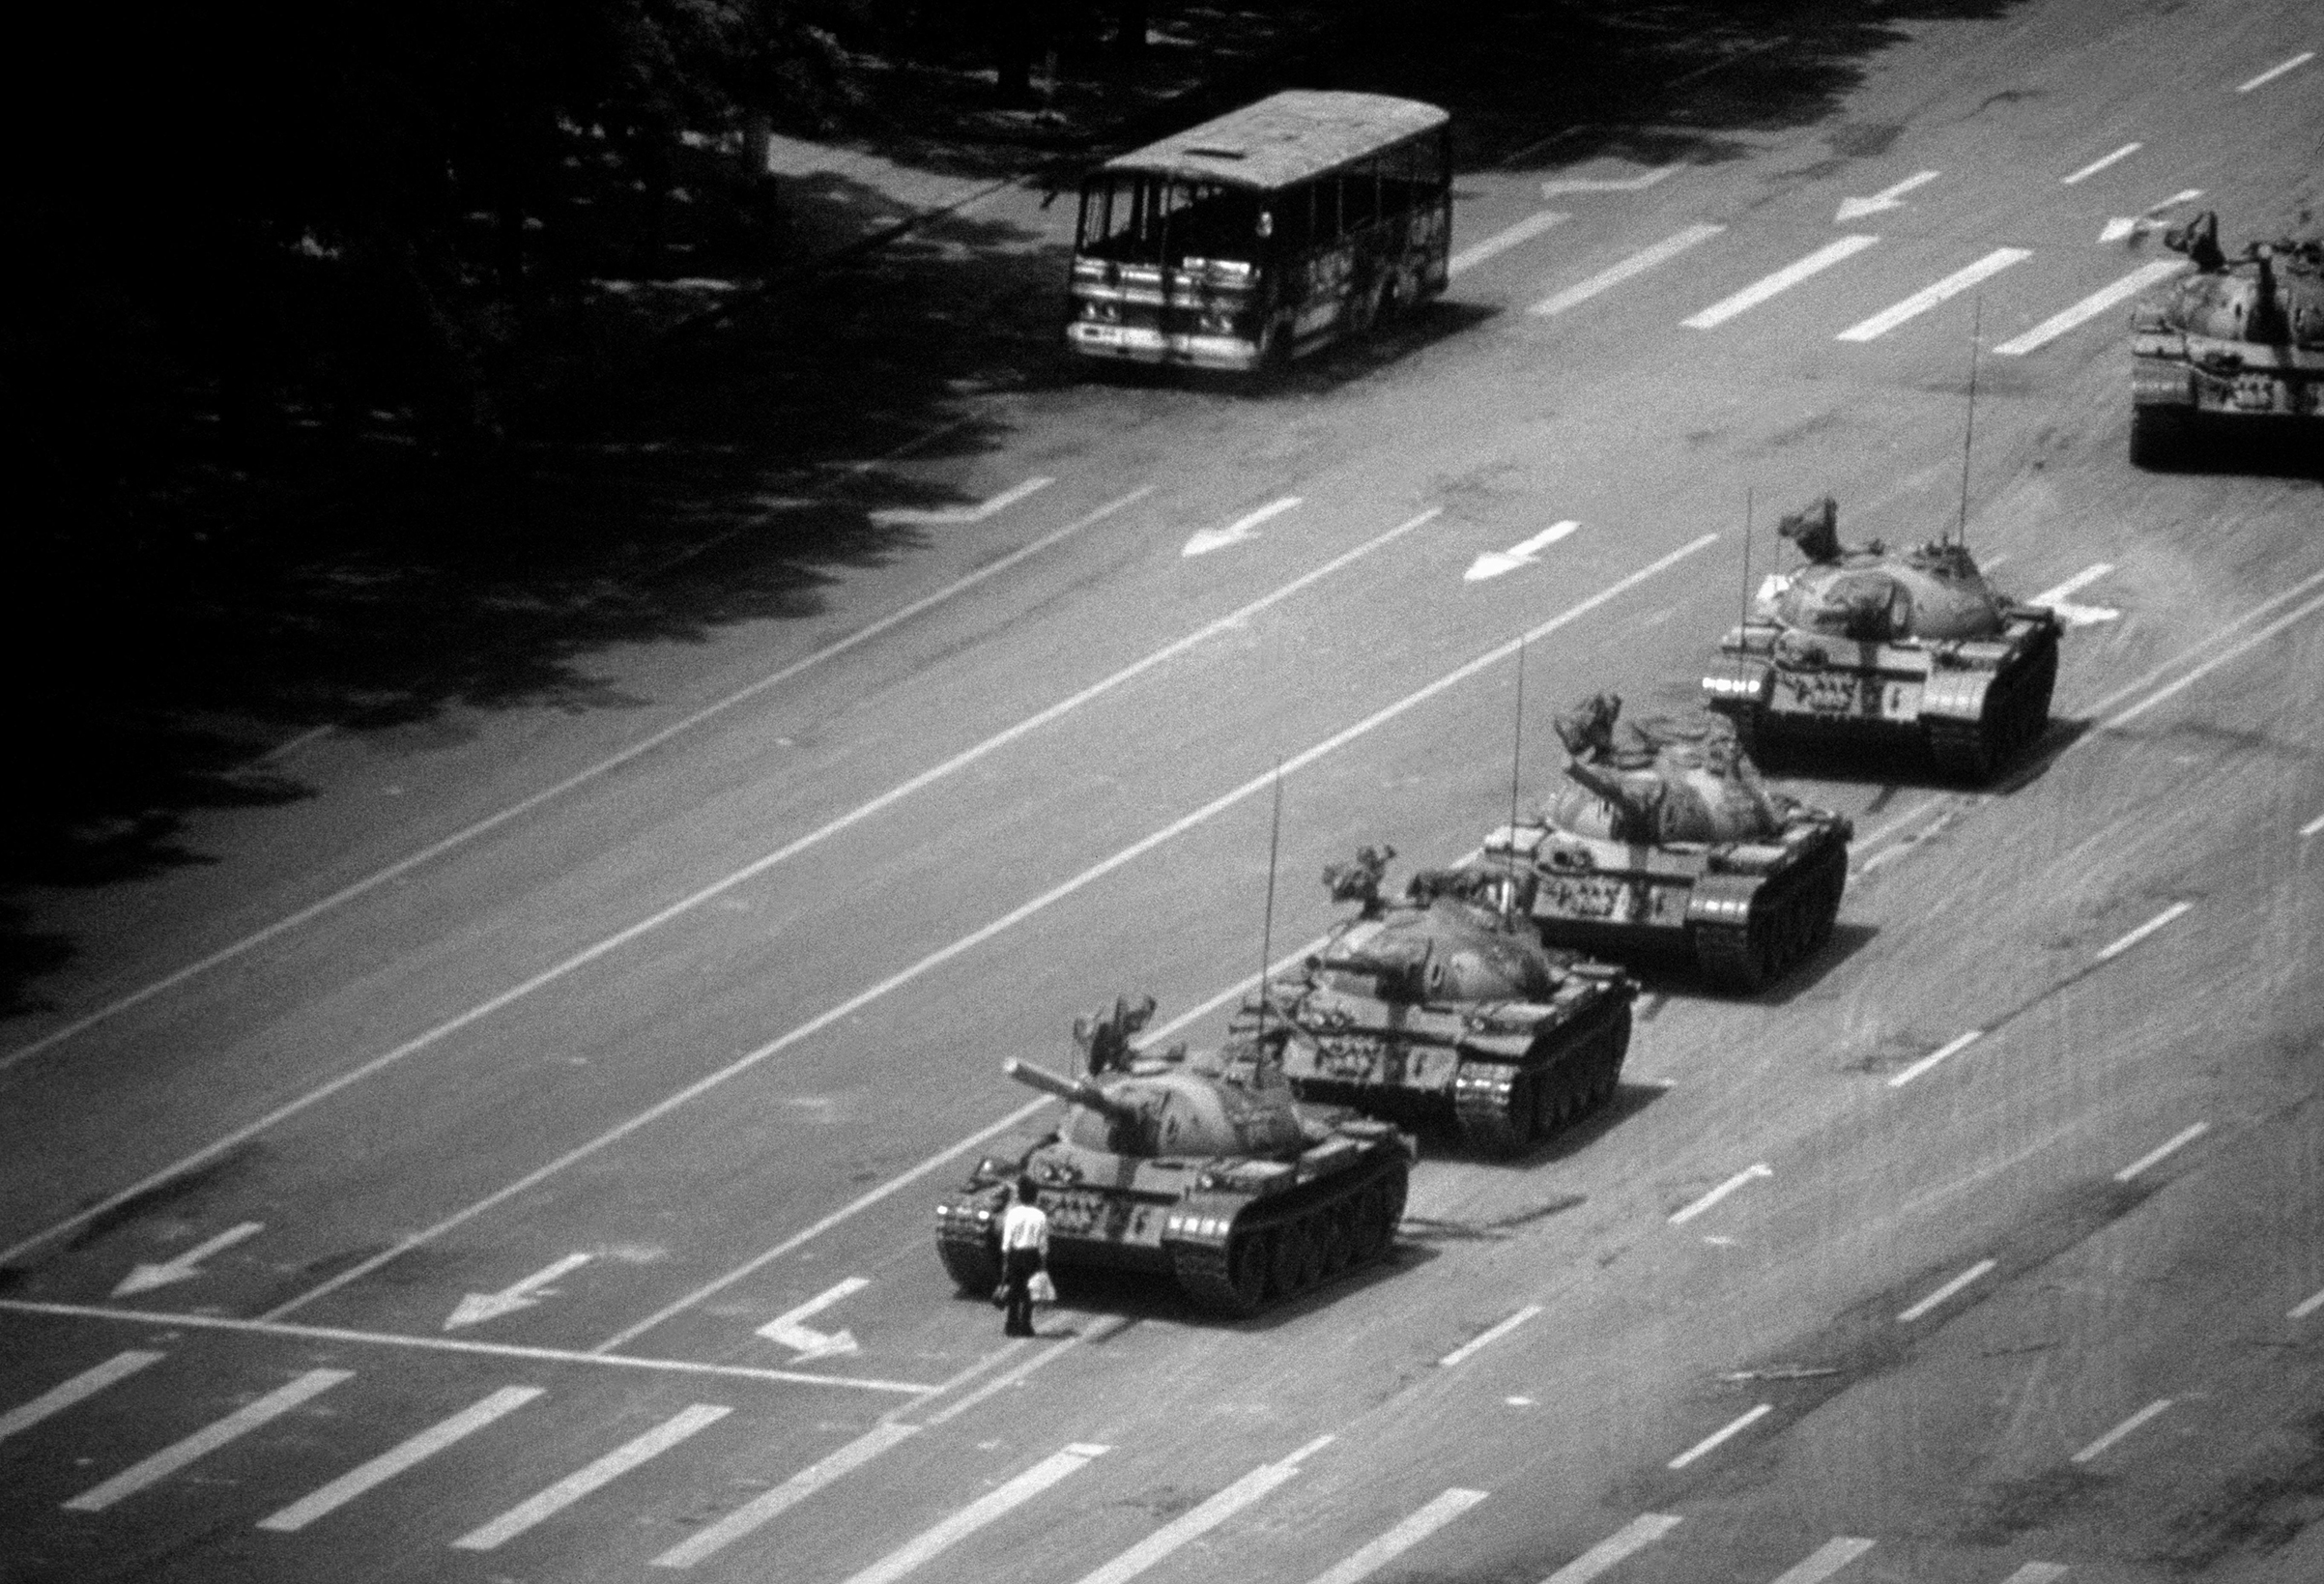 'The Tank Man' in Tiananmen Square. Beijing, June 4, 1989.